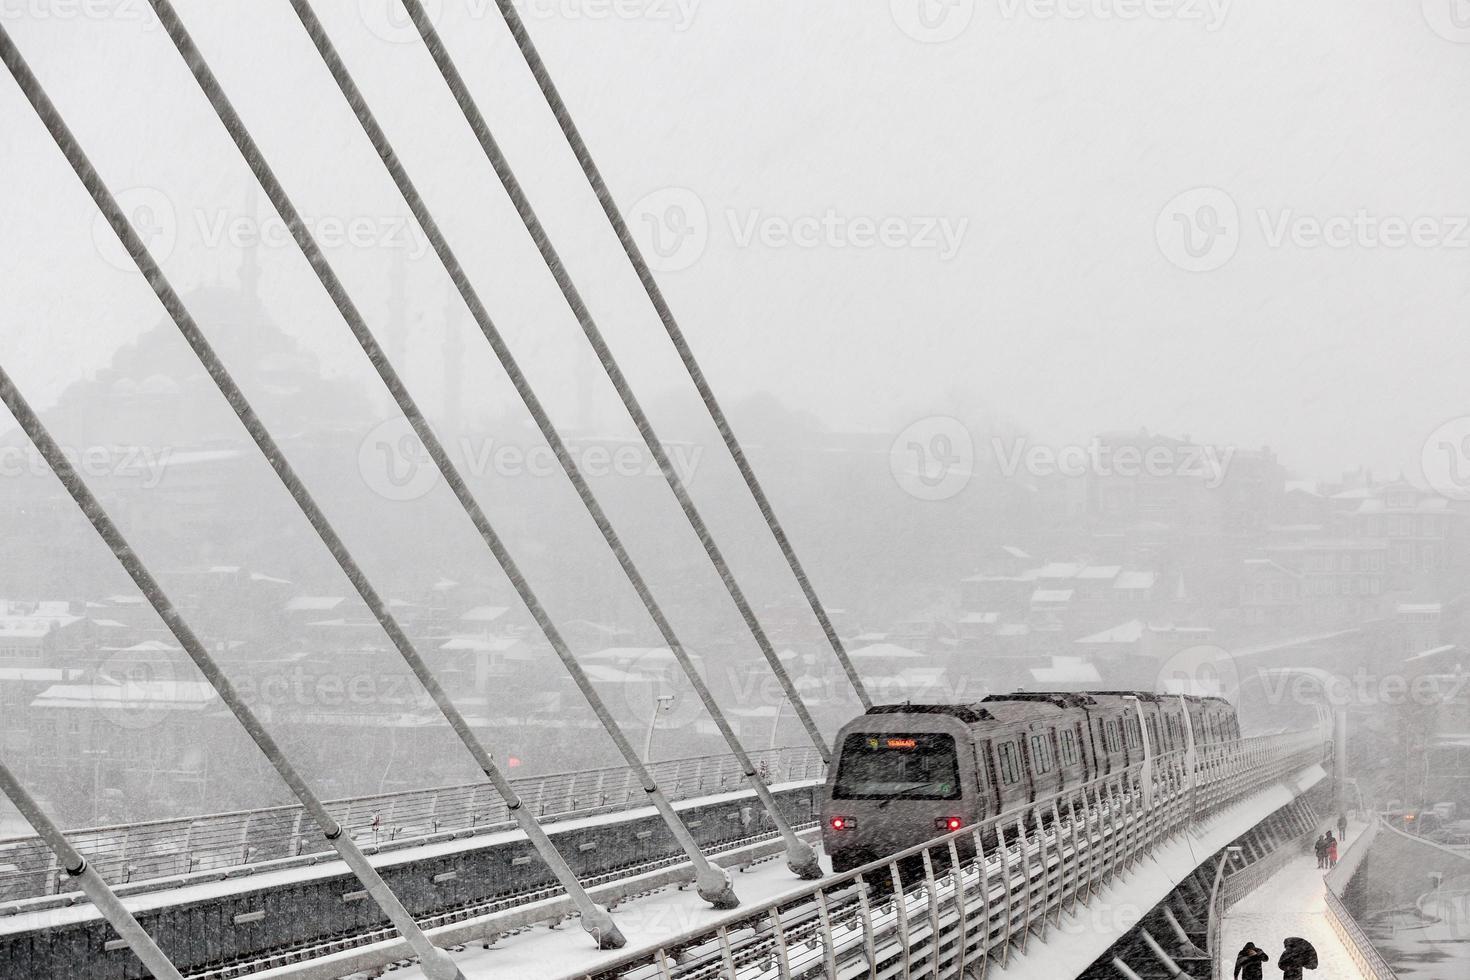 Metro train at the Halic Bridge in winter photo